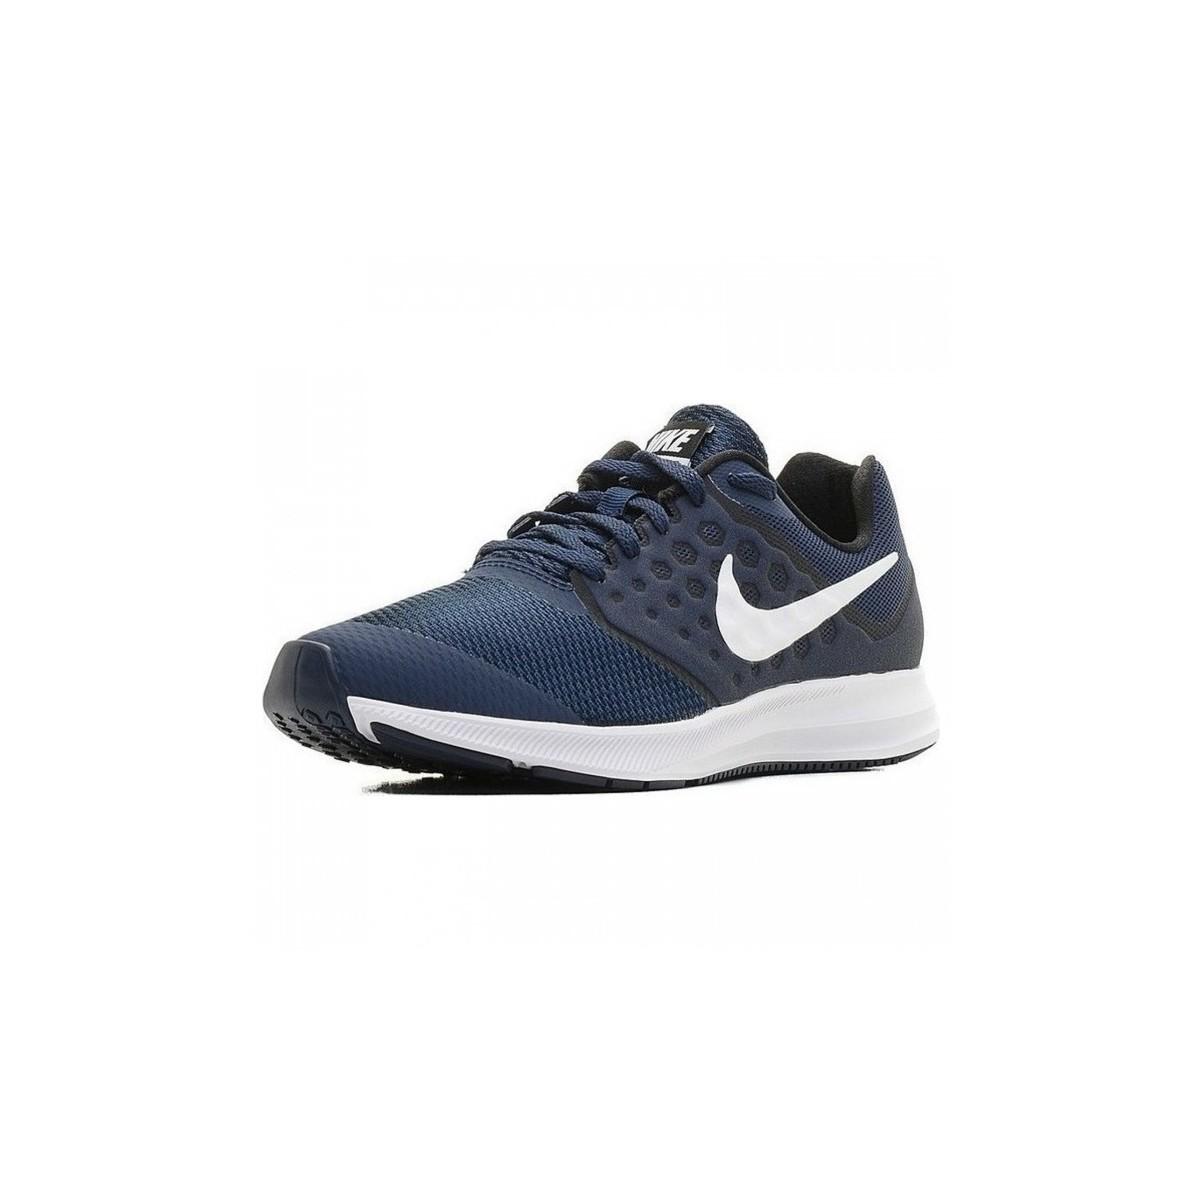 ... Nike Niño Zapatilla Downshifter 7 GS 869969 400 Azul Marino ...